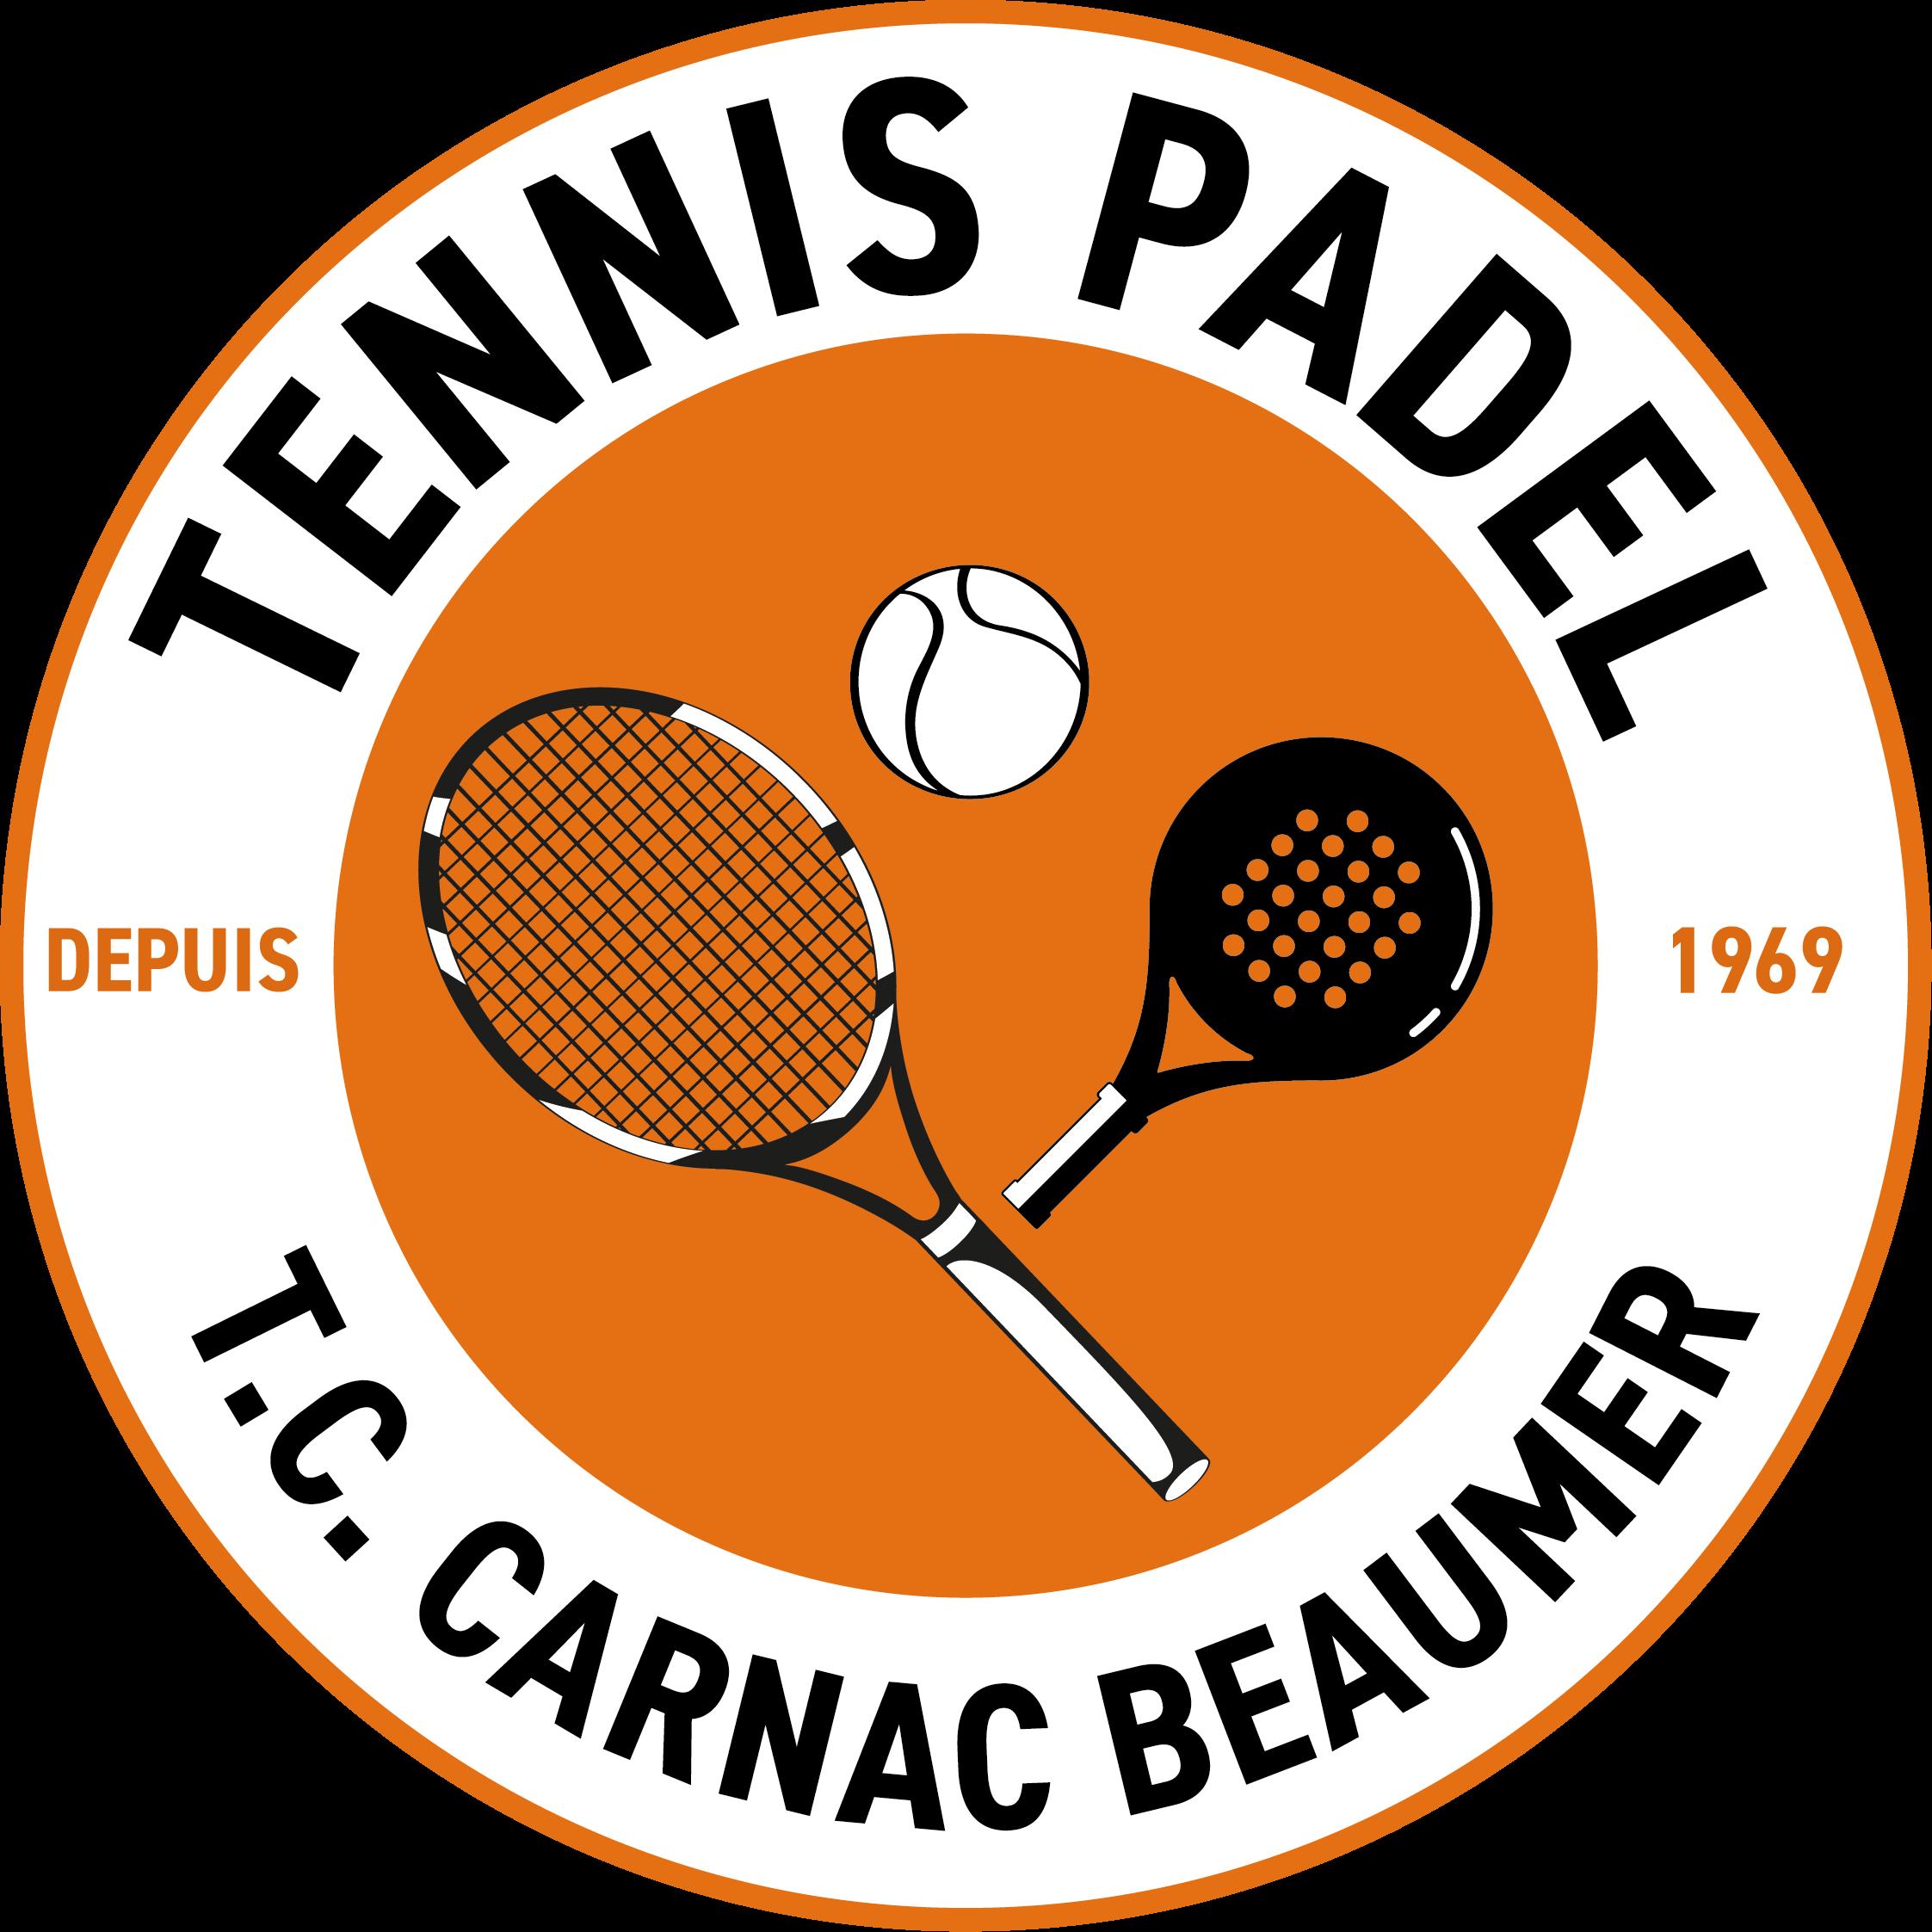 Tennis Padel Carnac Beaumer